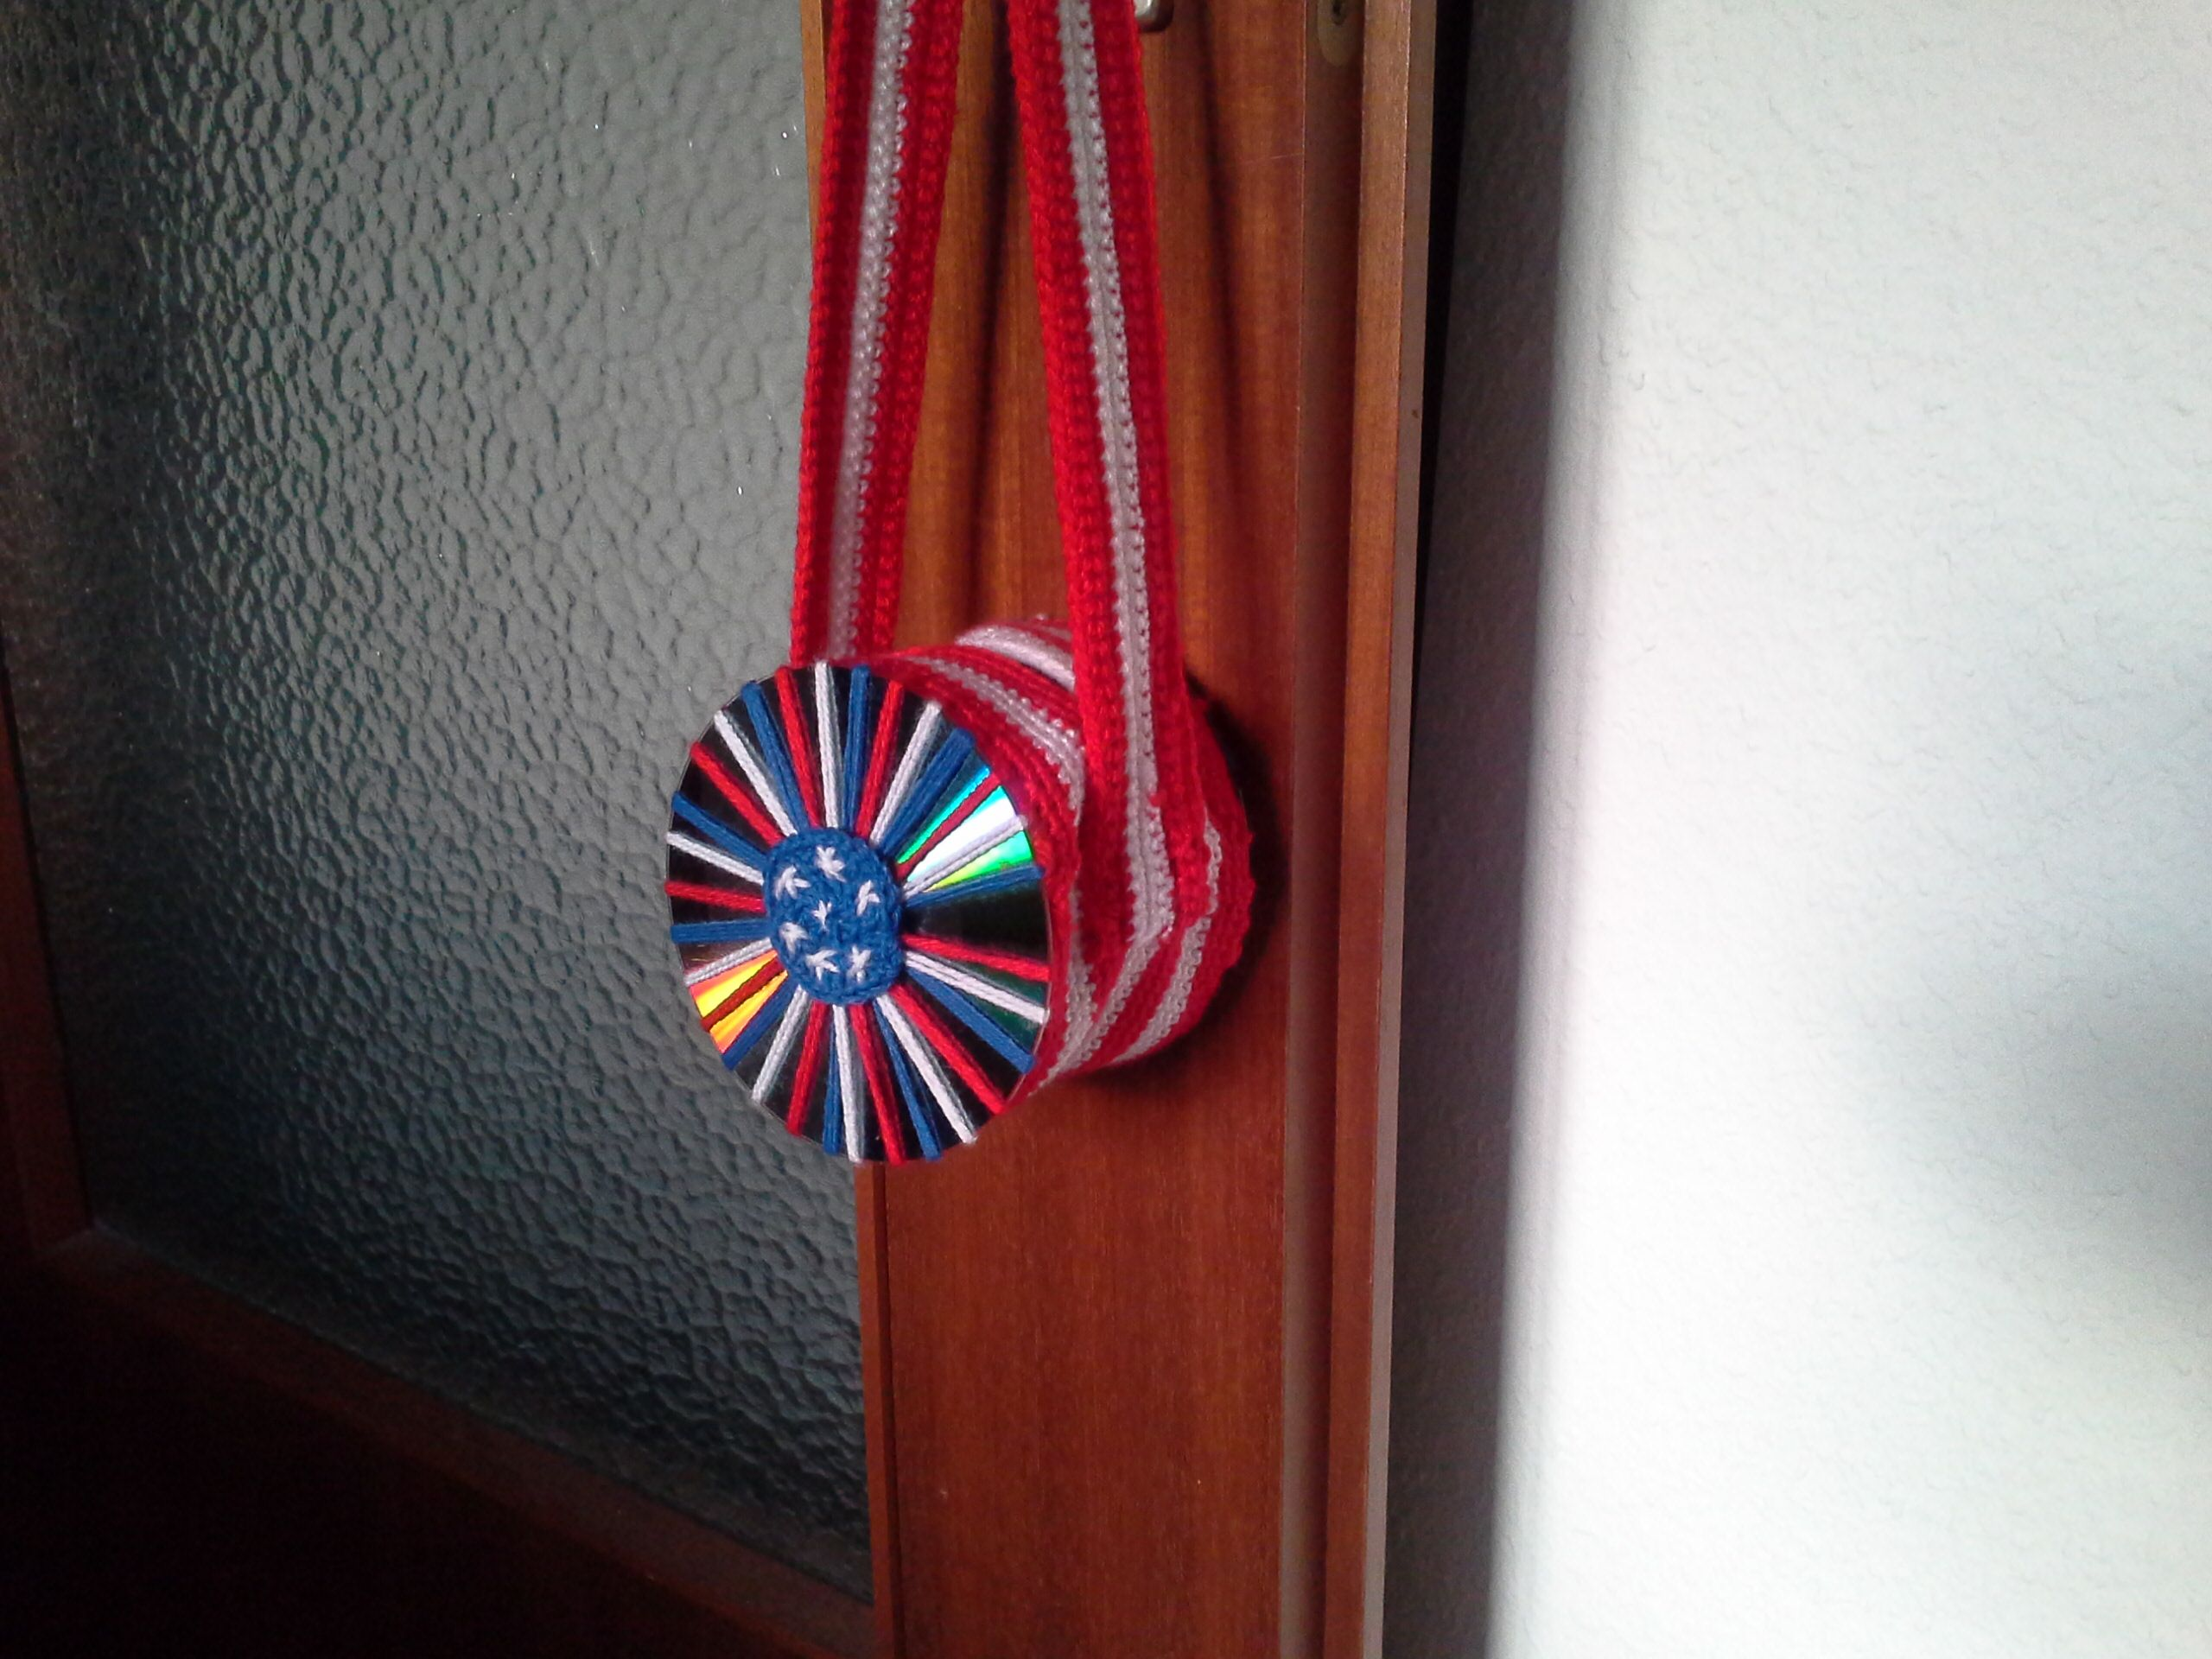 Crochet Tasche https://www.facebook.com/photo.php?fbid=423150927793787&set=a.405009609607919.1073741831.405004926275054&type=3&theater